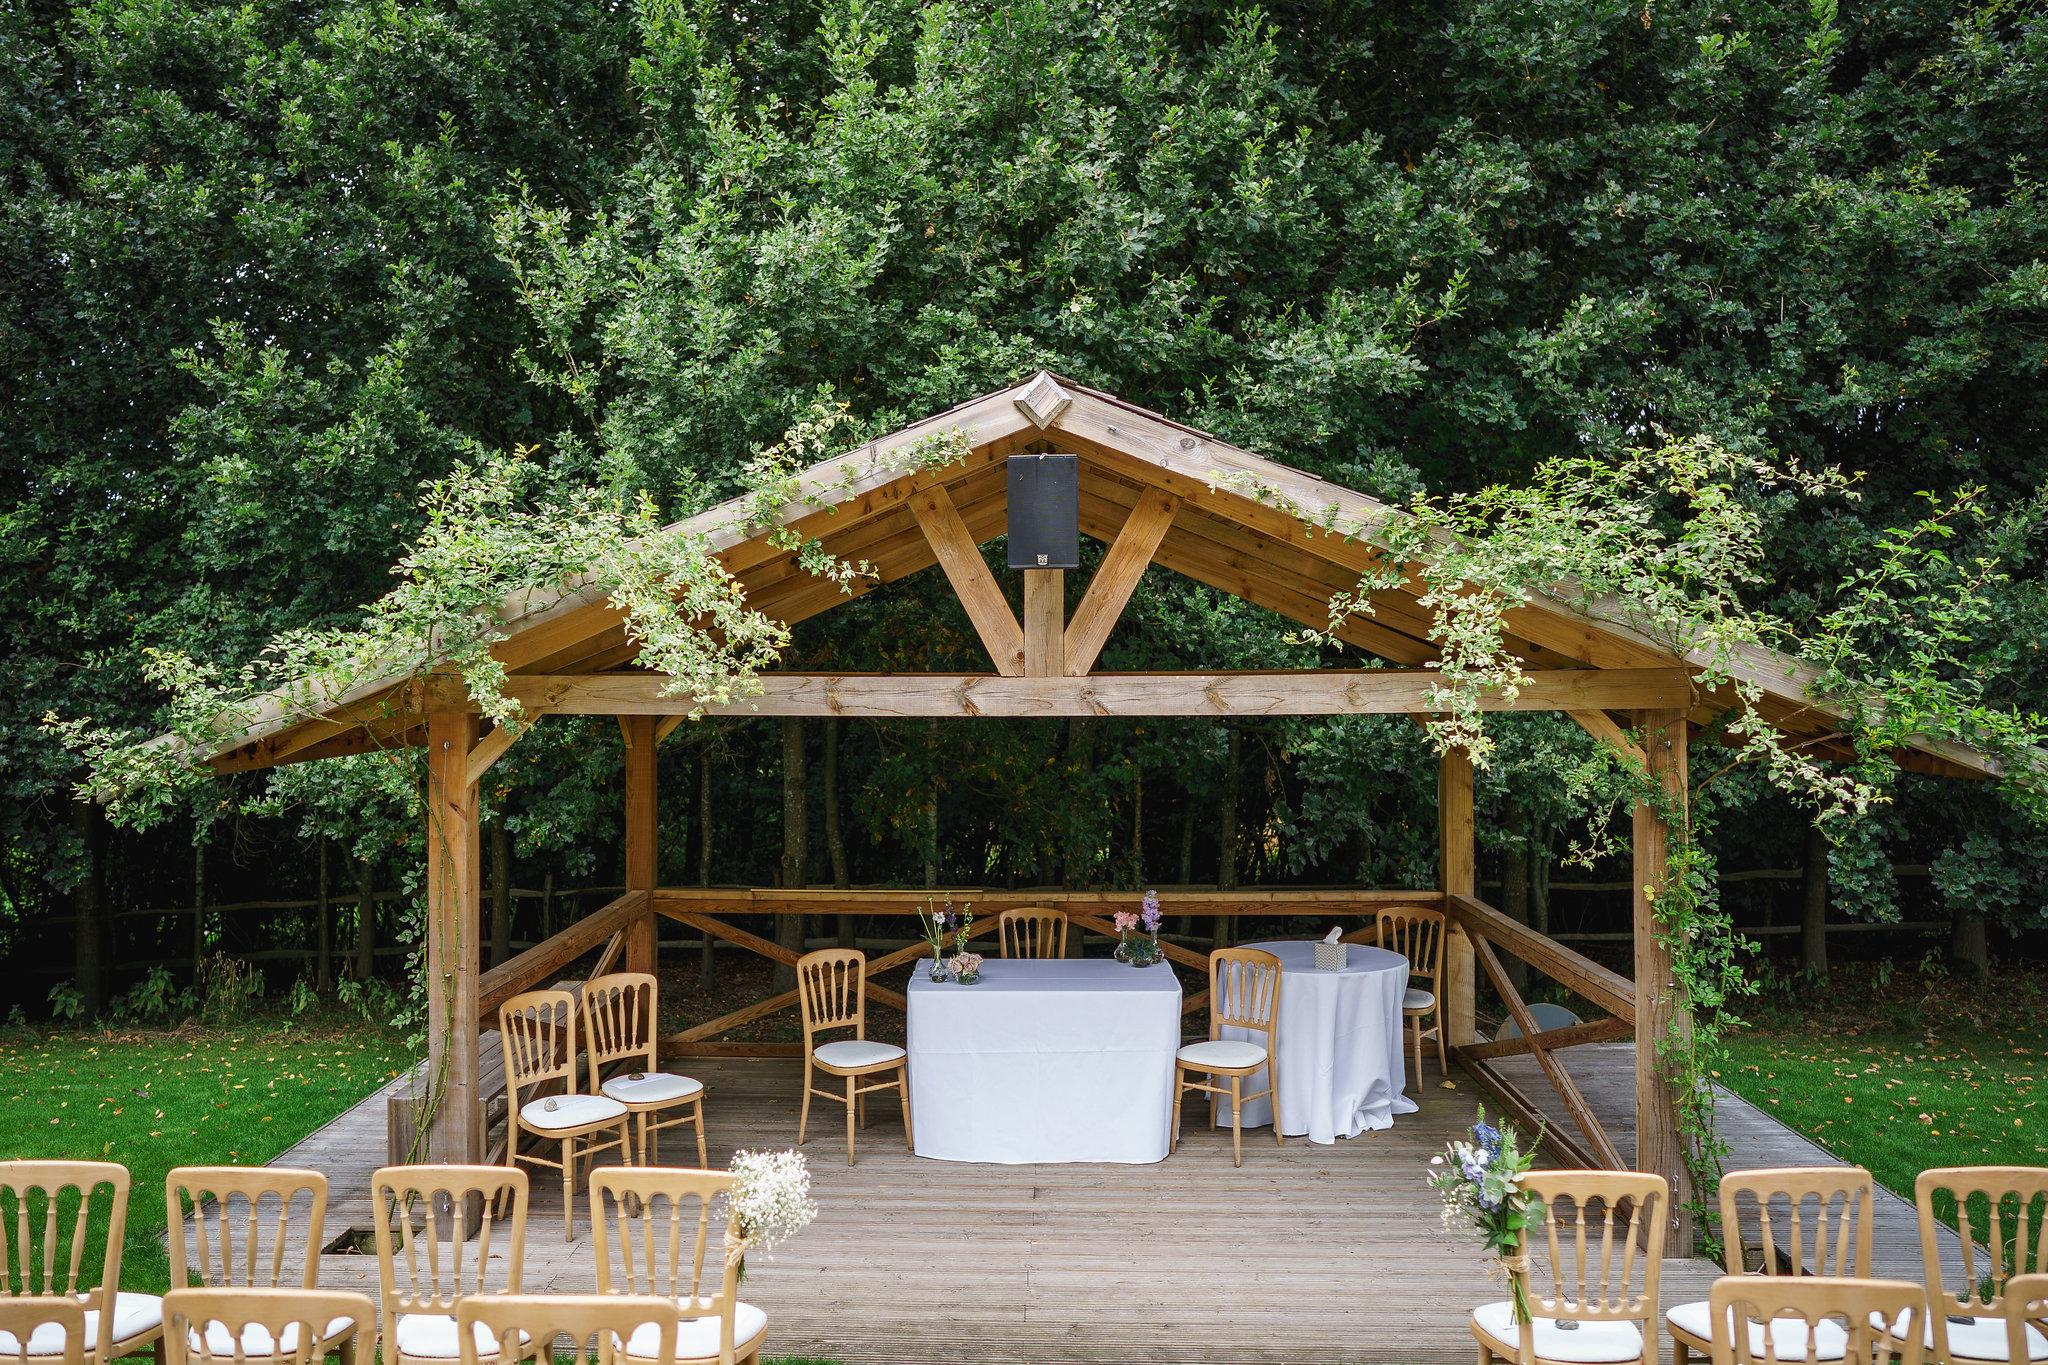 Esther Wedding at Bury Court Barn